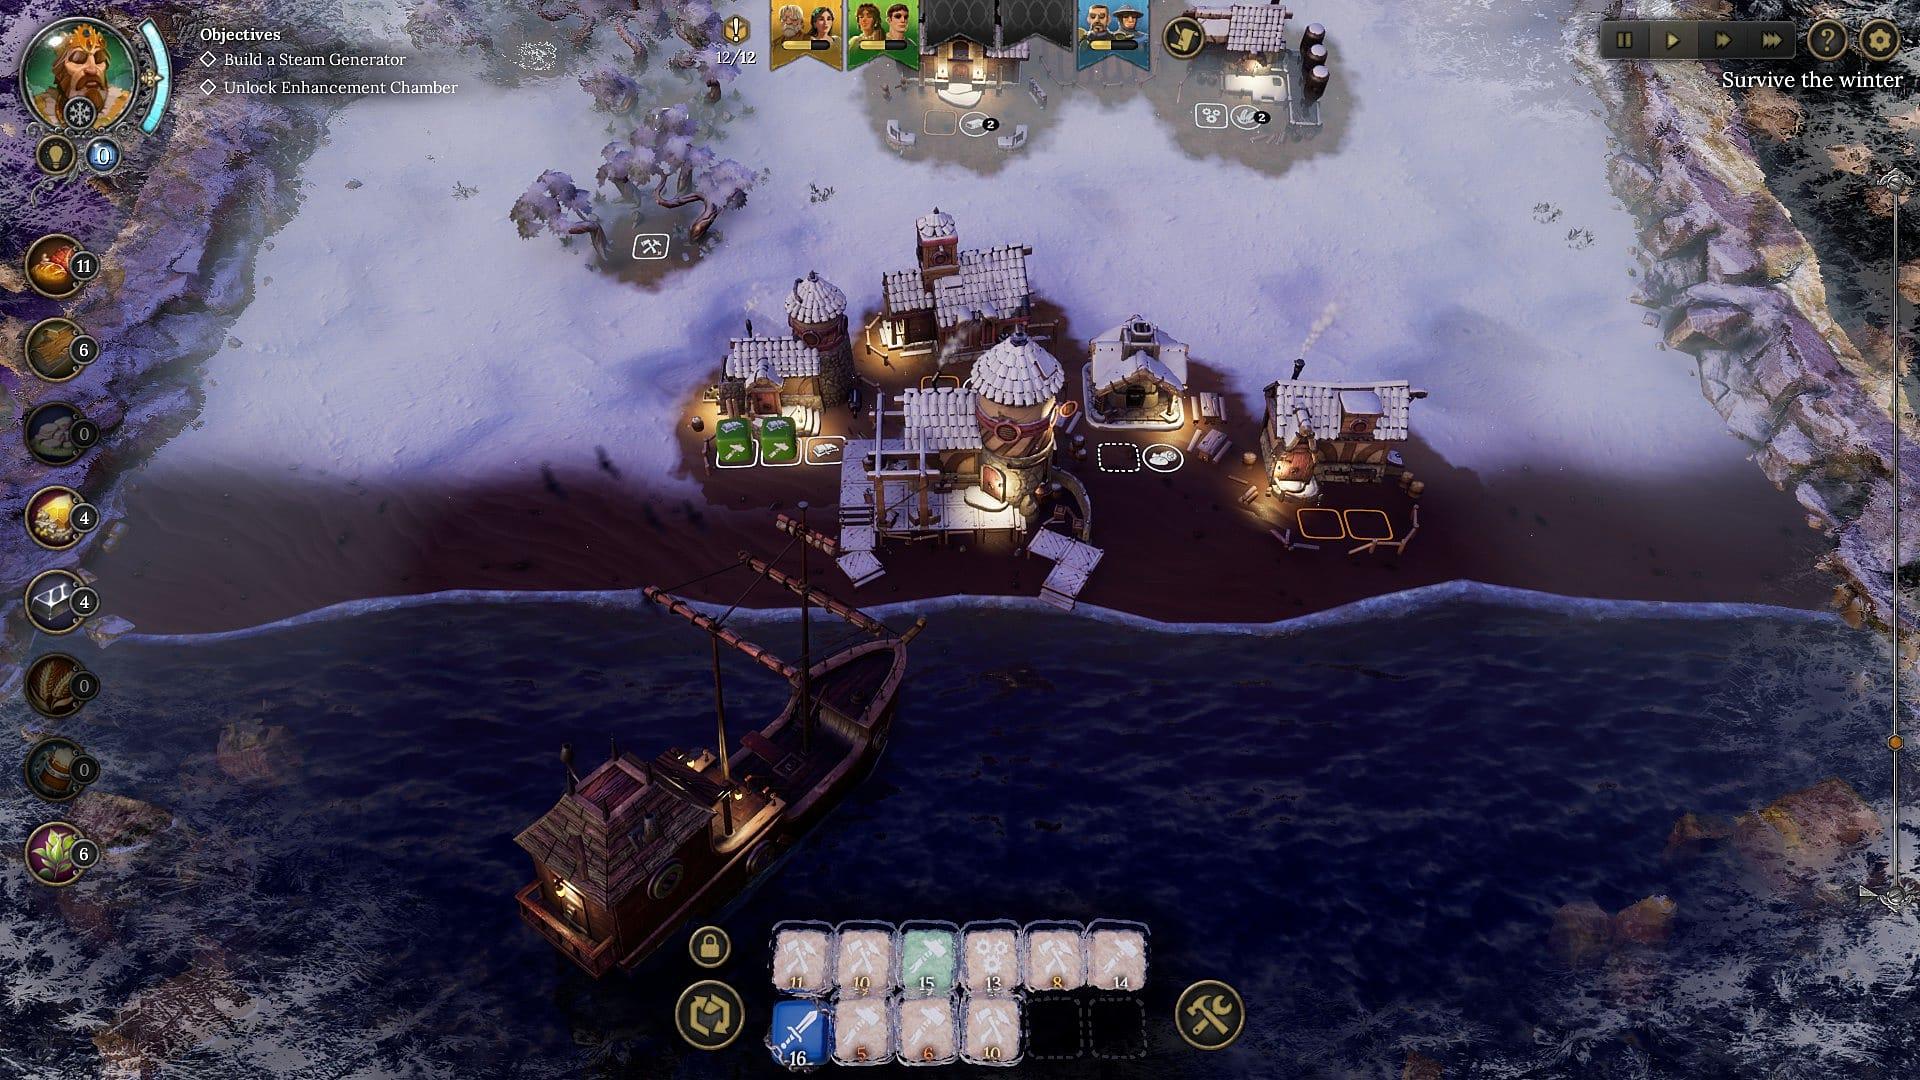 dice-legacy-deluxe-pc-screenshot-1